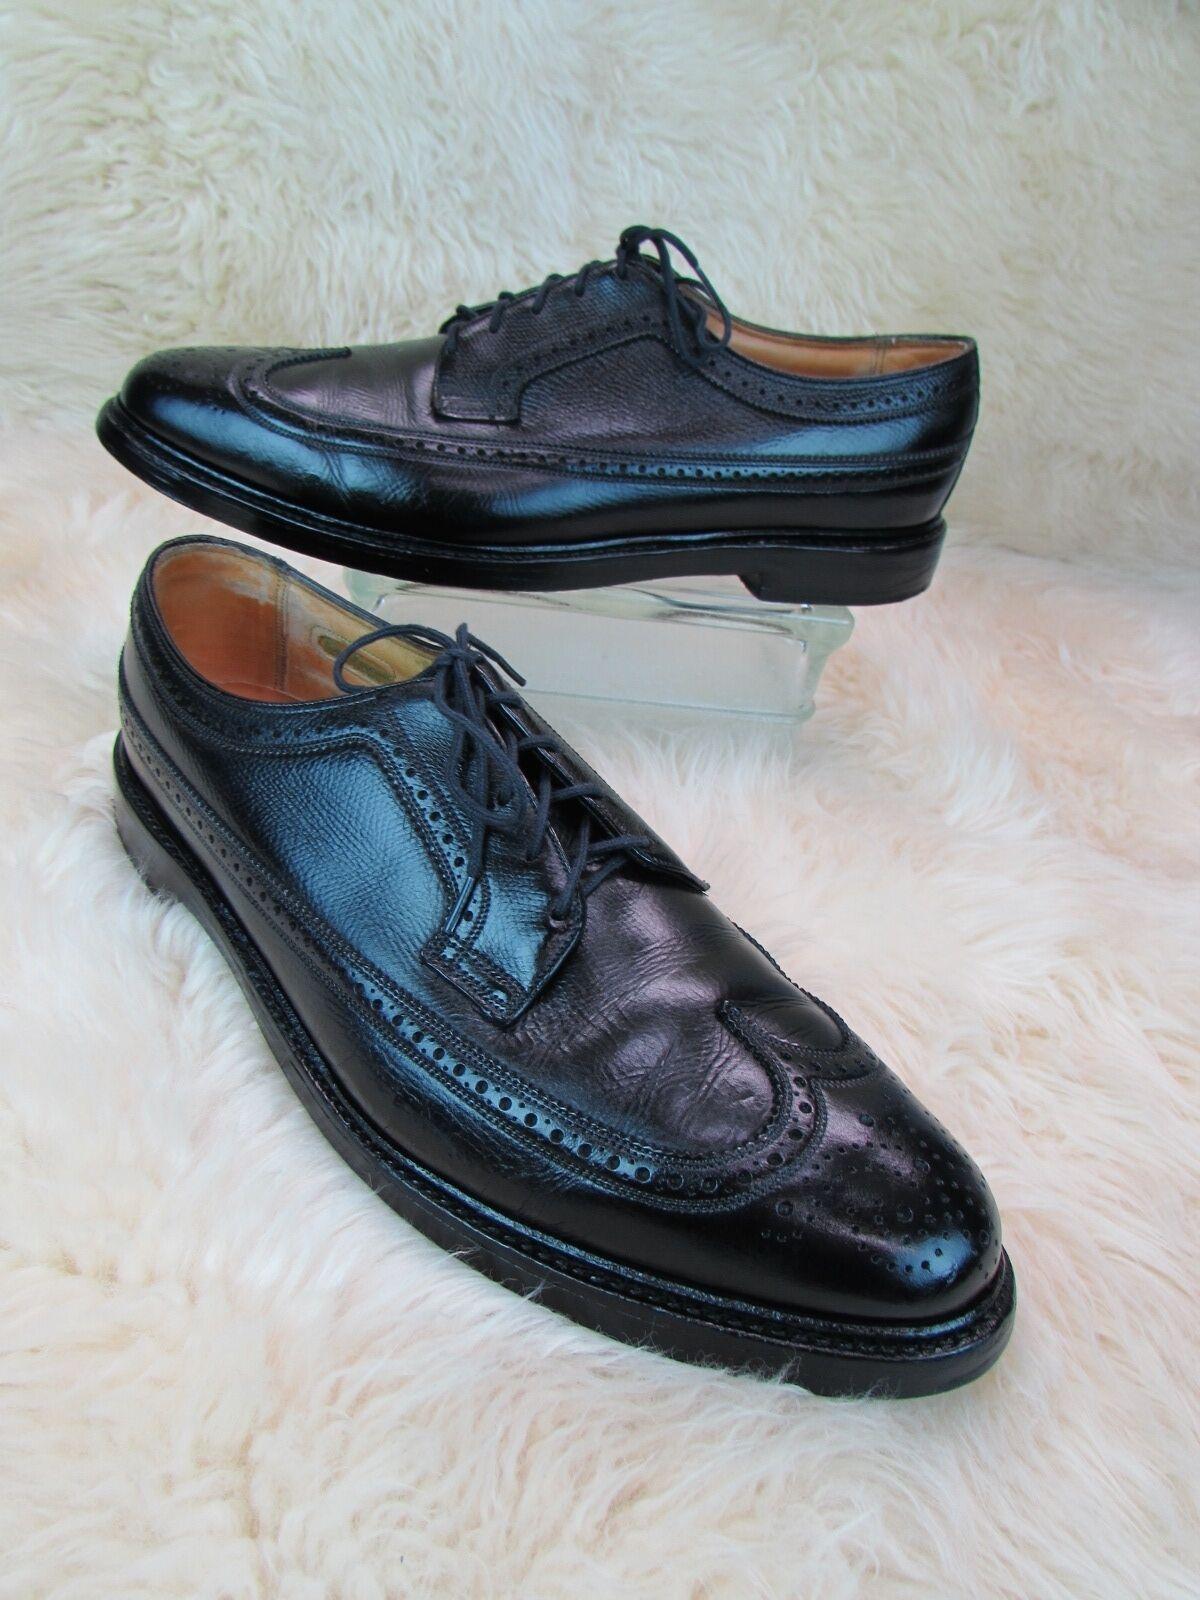 Florsheim Royal Imperial  V-Cleat Wingtip Oxford shoes Black Sz. 12 C